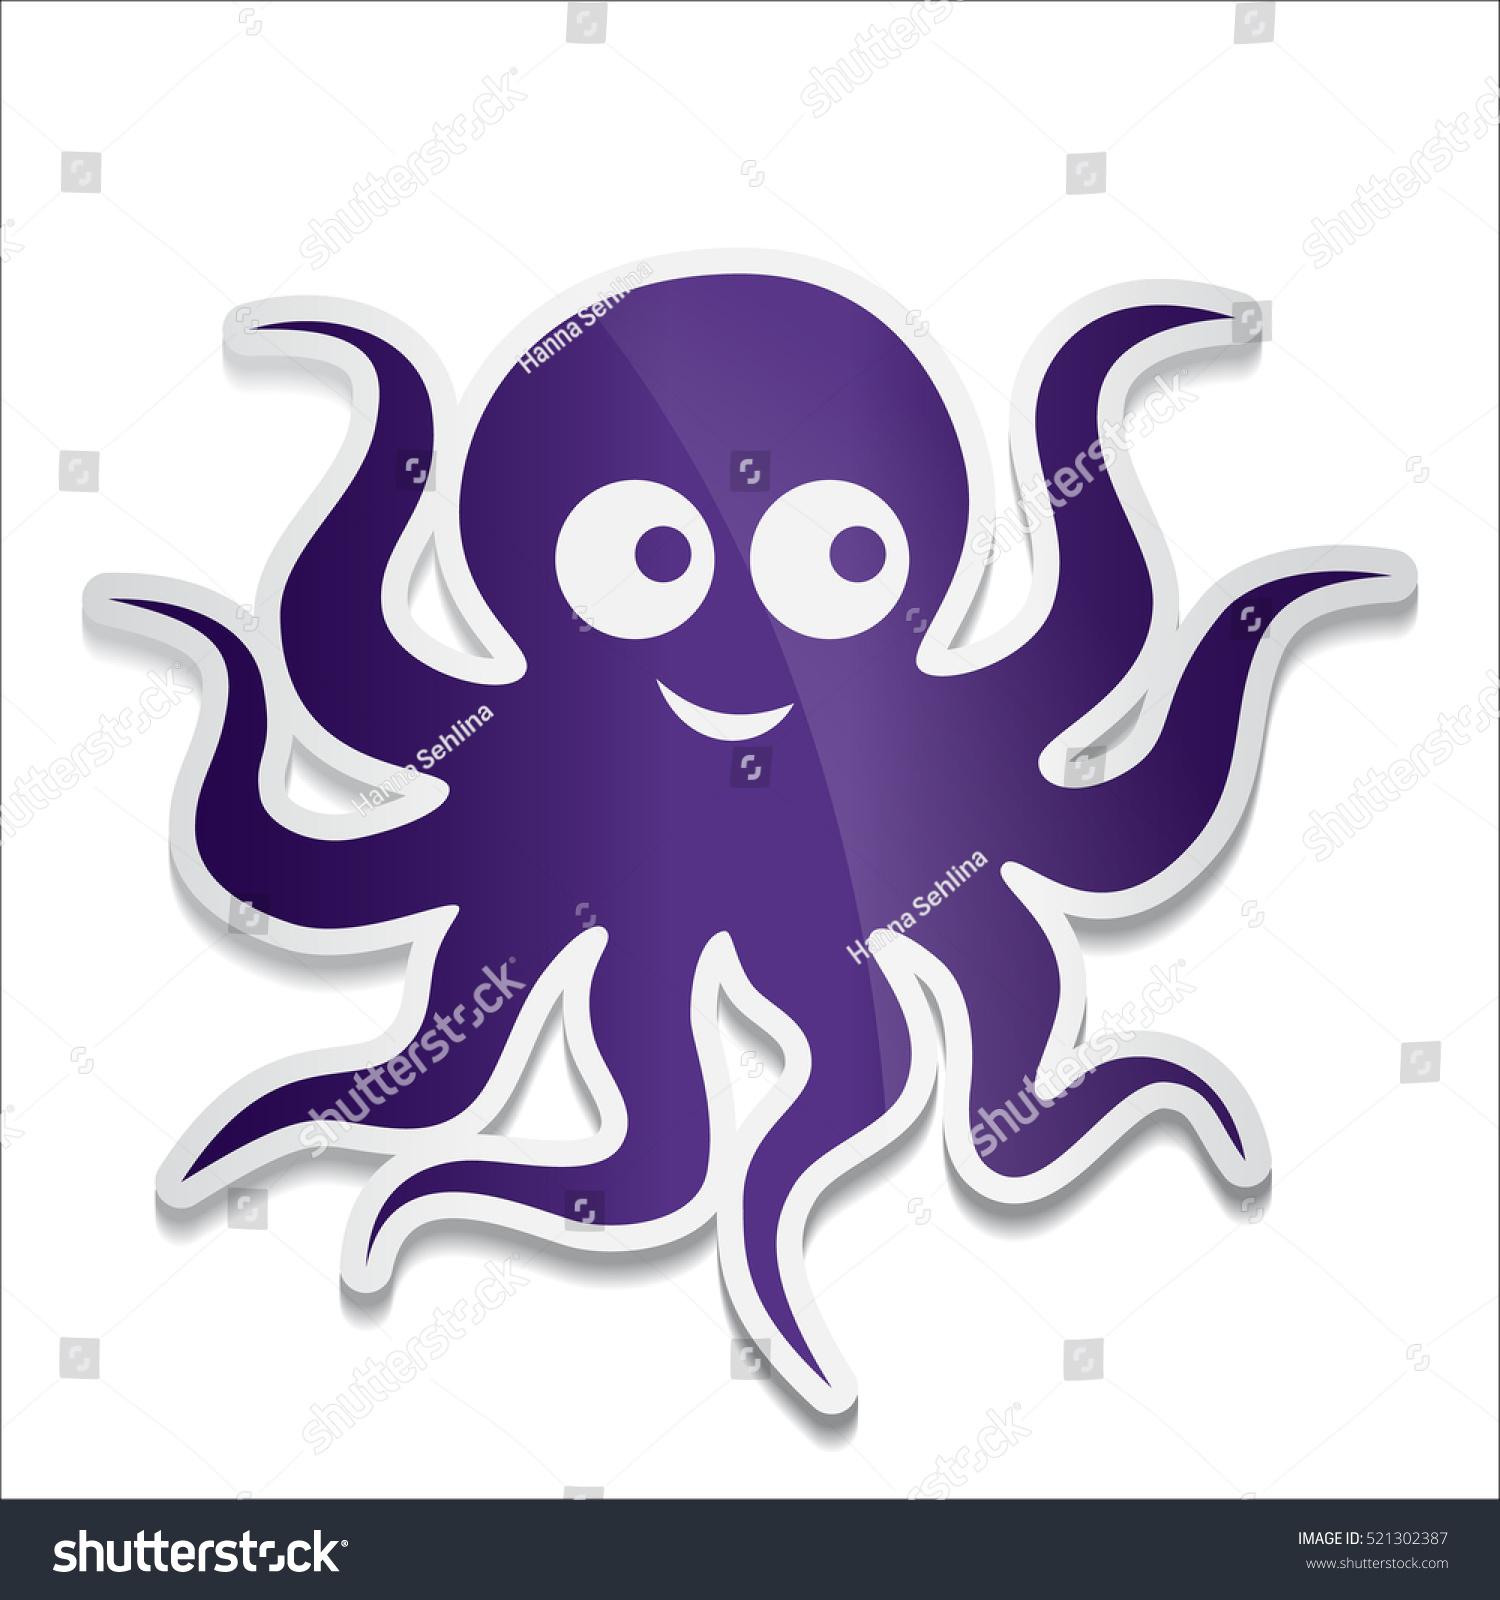 Cartoon Octopus Vector Illustration On White Stock-Vektorgrafik ...